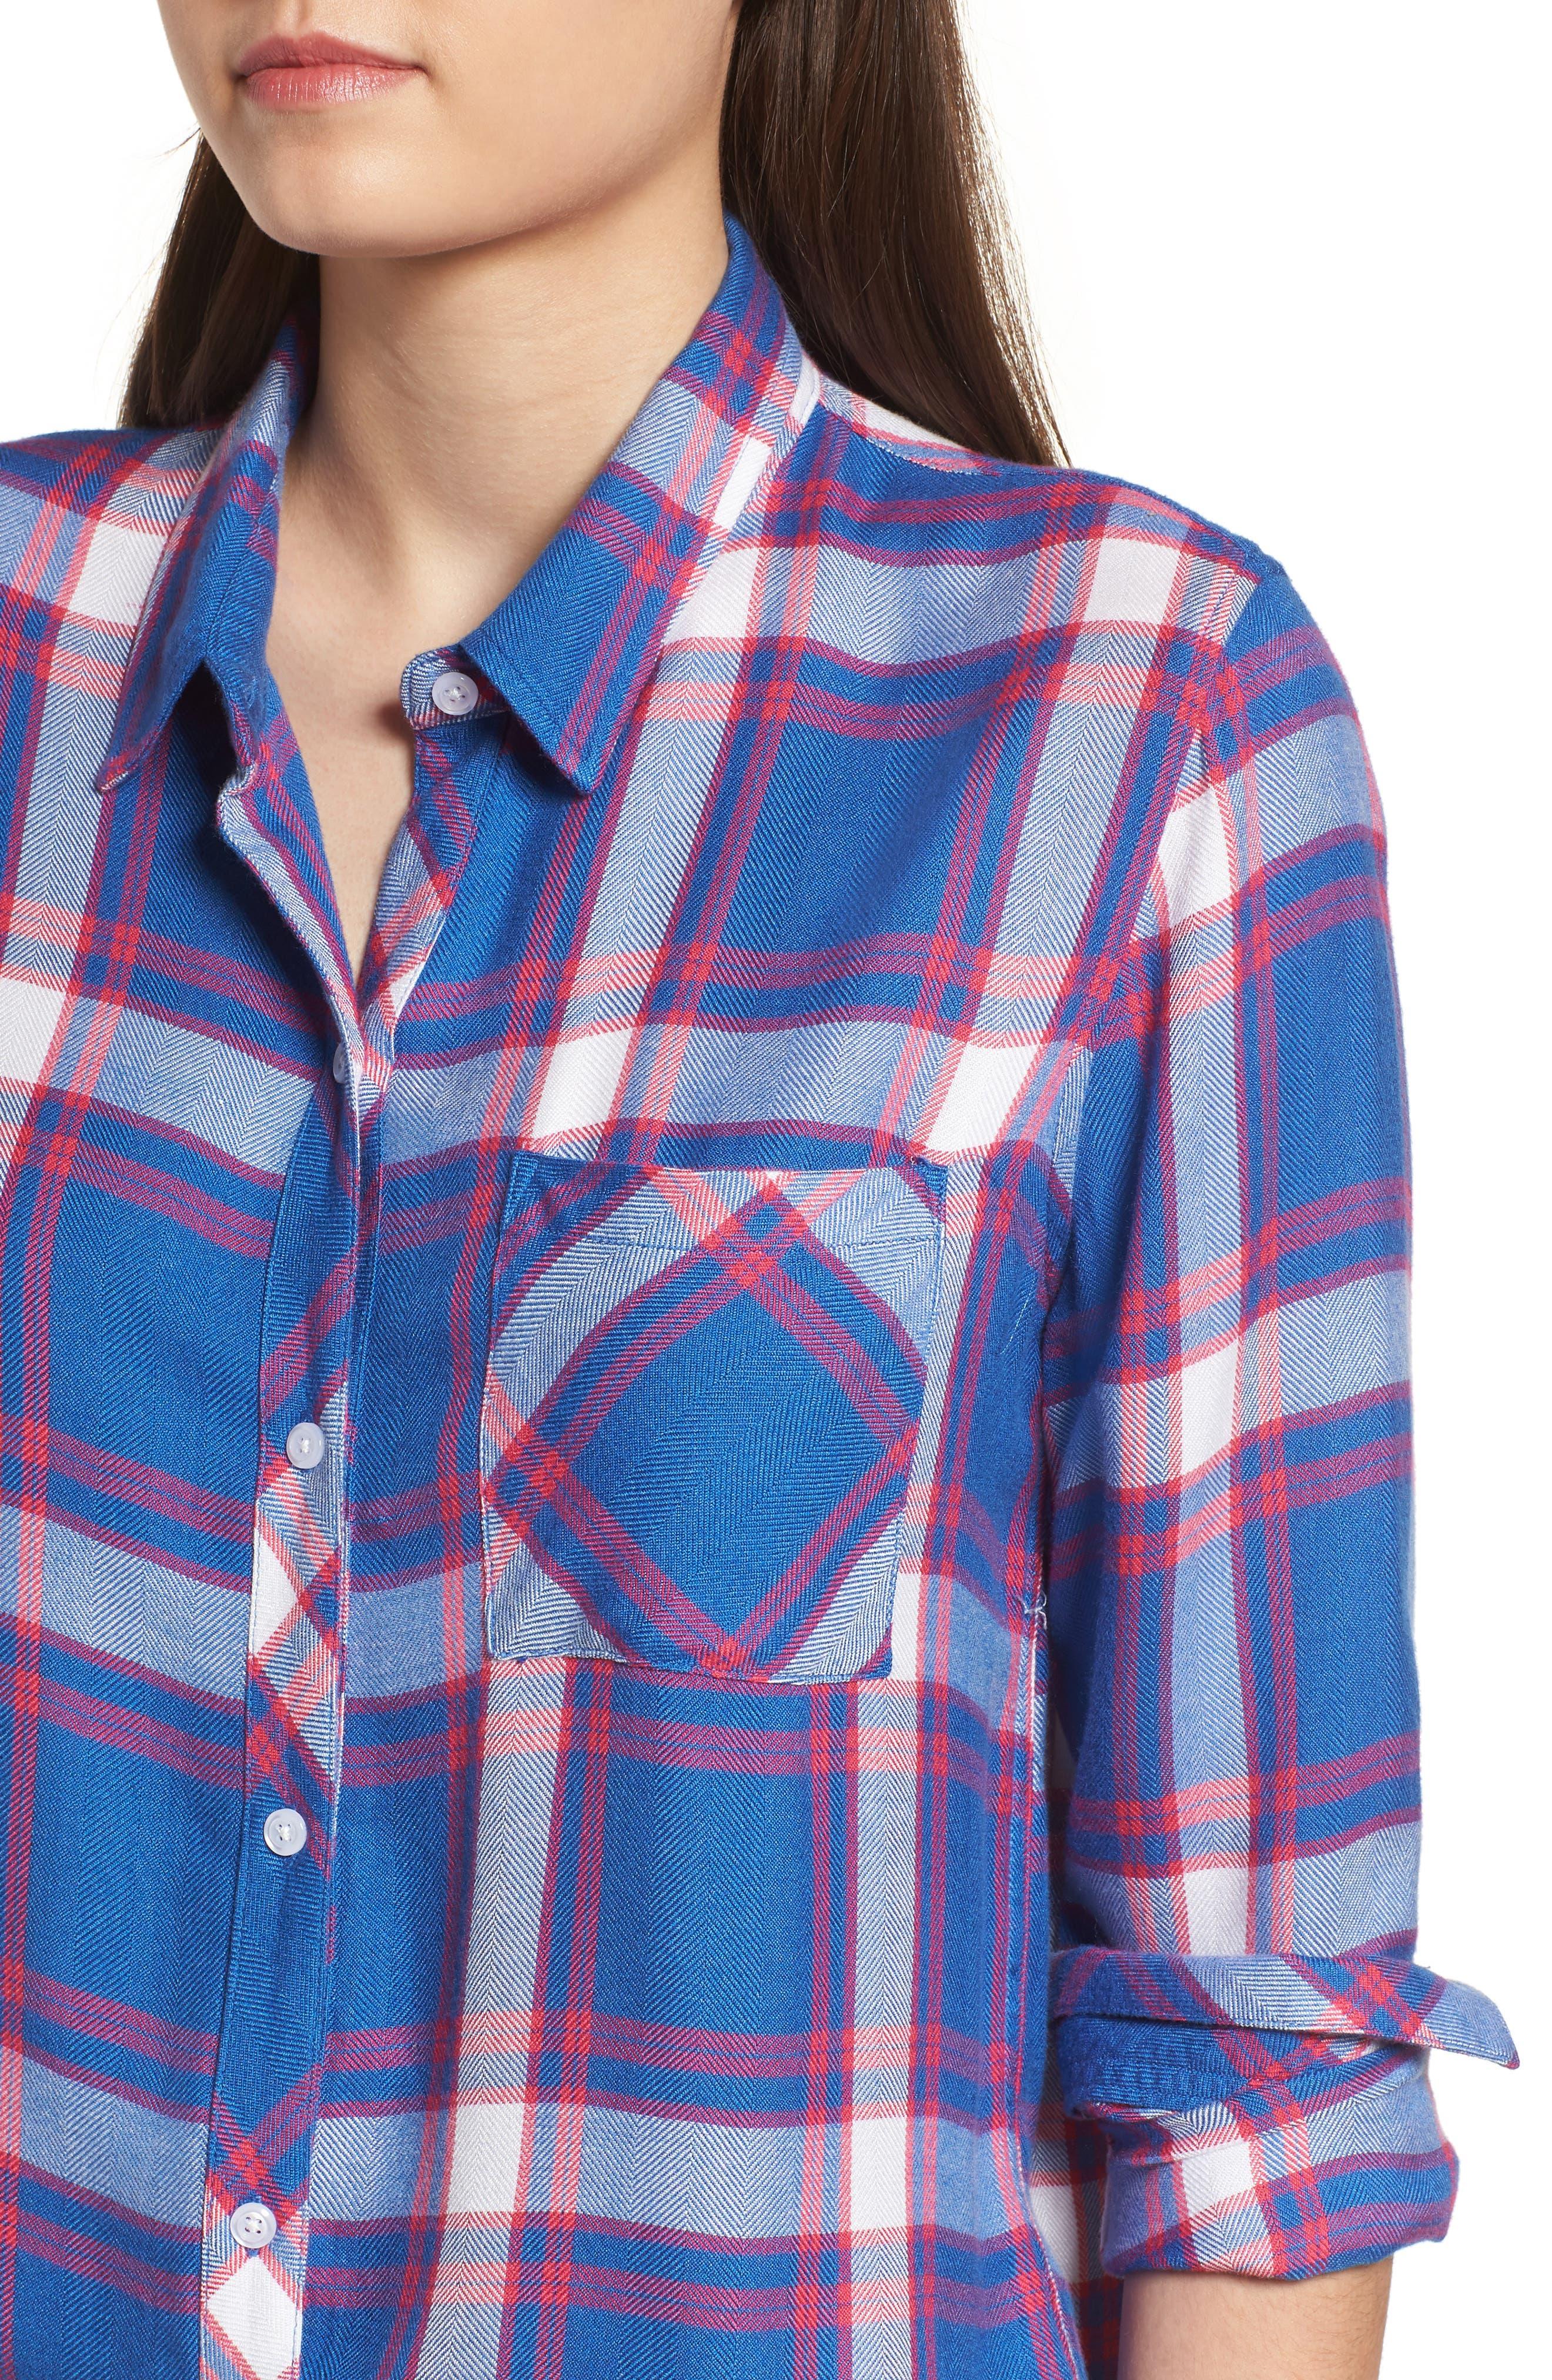 Hunter Plaid Shirt,                             Alternate thumbnail 4, color,                             RUBY SKY WHITE